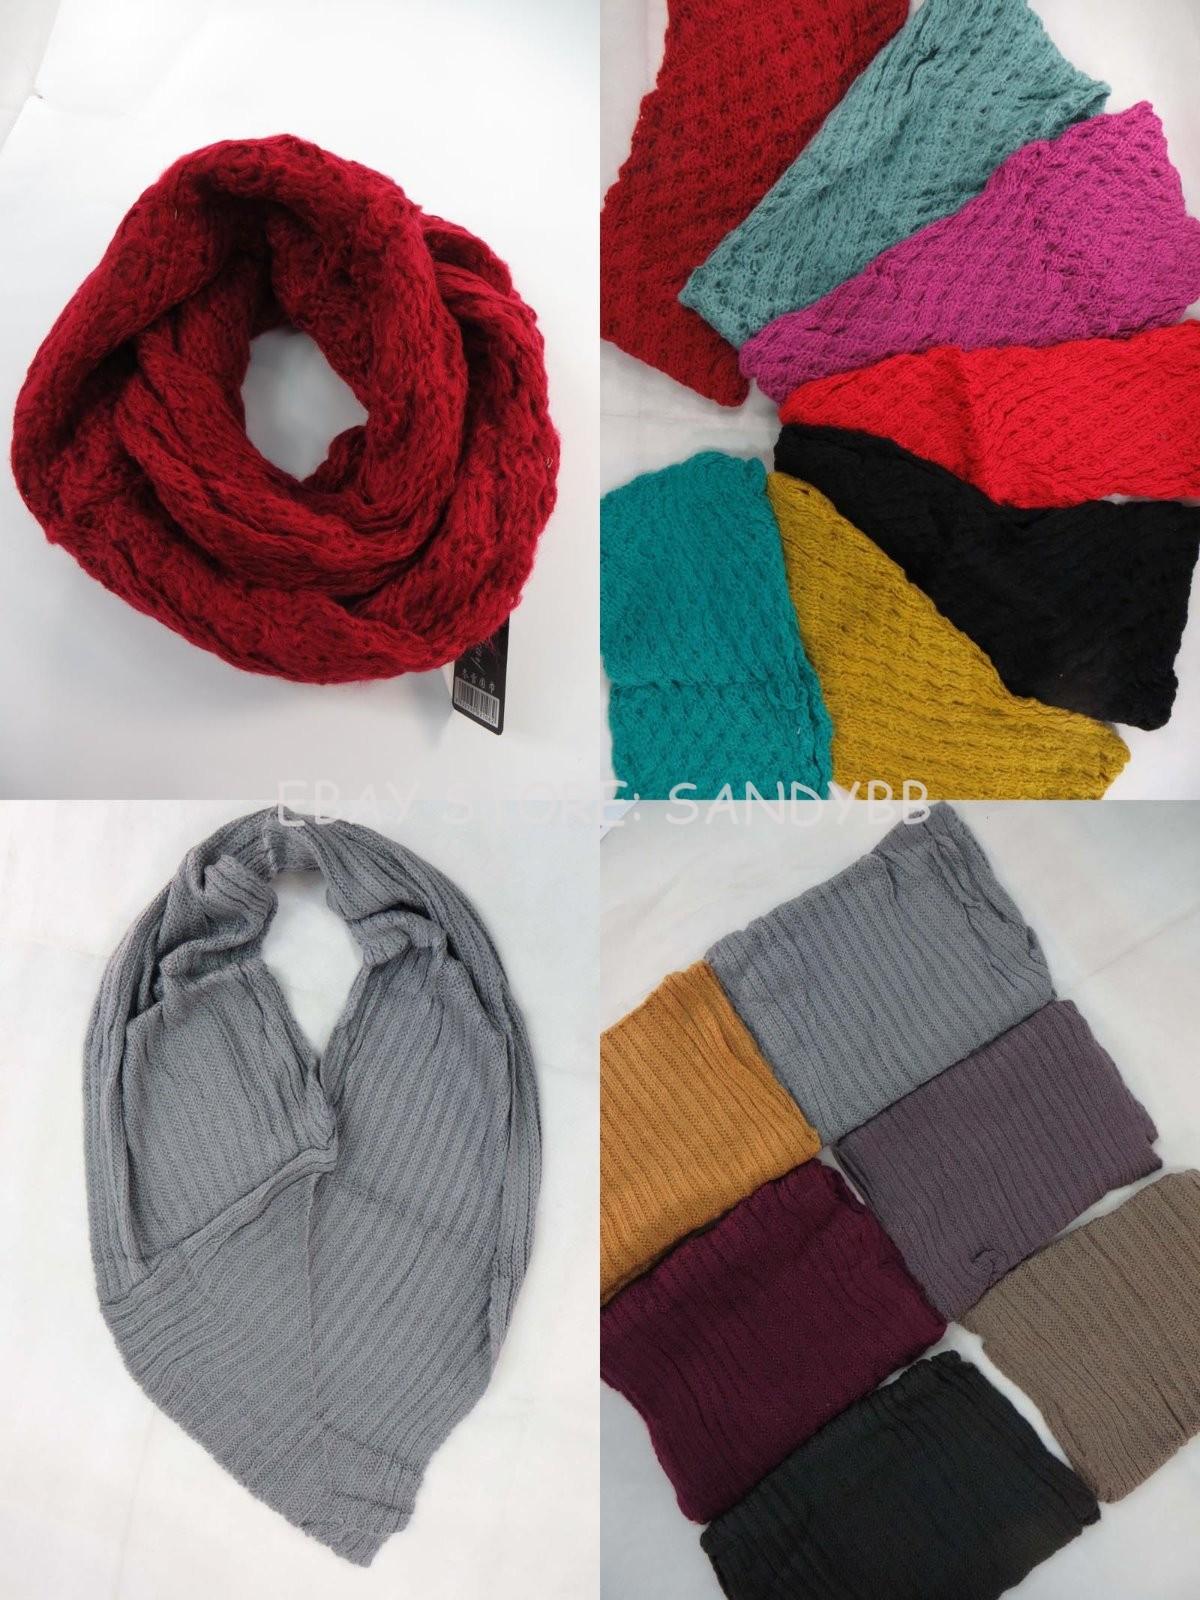 US SELLER-lot of 4 double loop knit infinity scarf wholesale winter neckwarmer